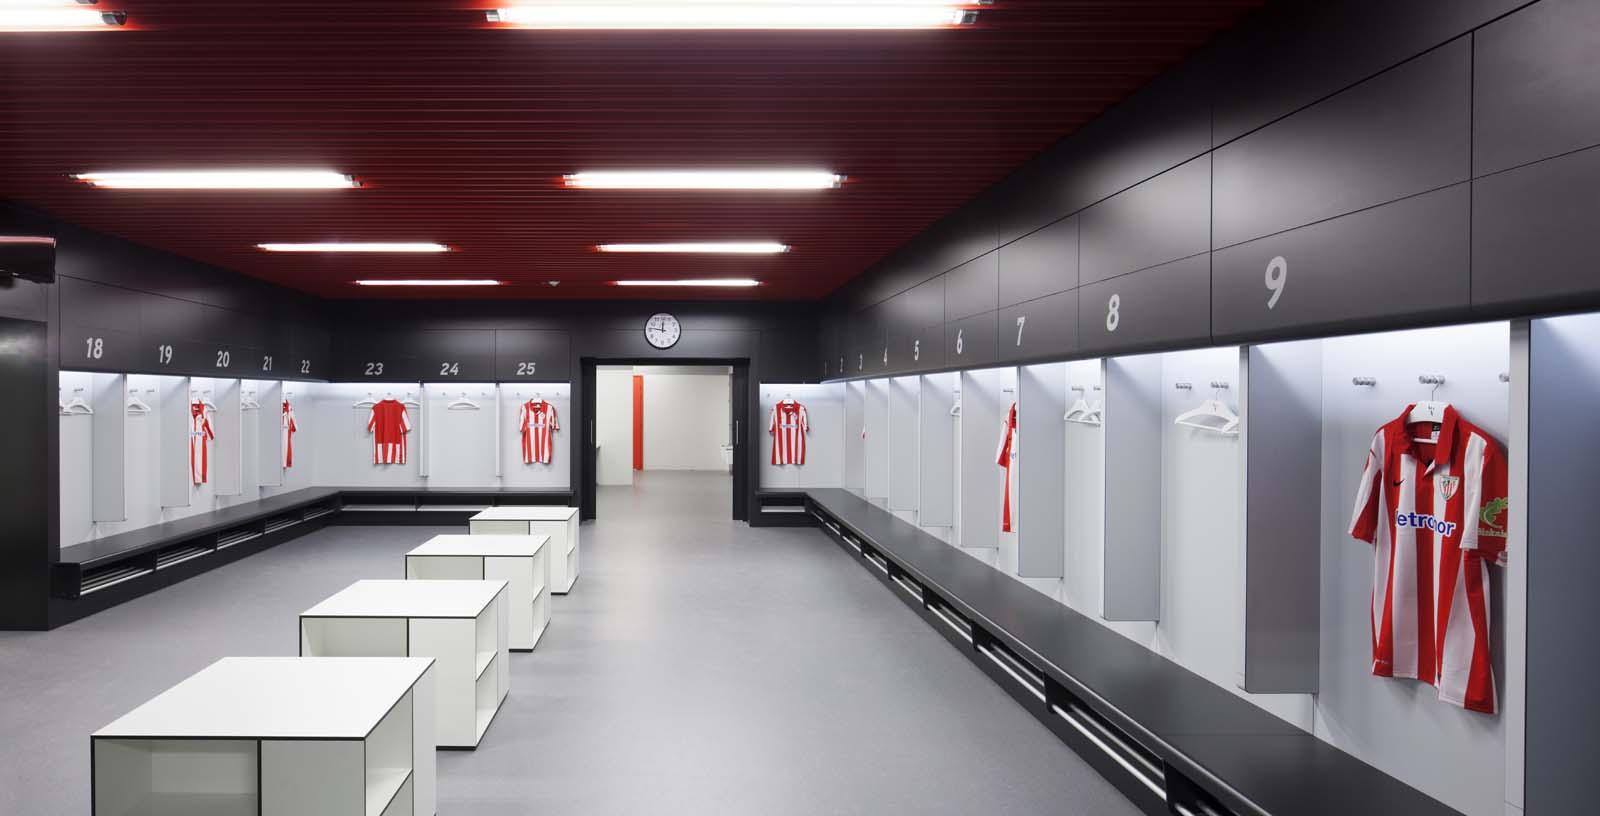 San_Mames_Stadium_05_Architecture_IDOM_photo_Aitor_Ortiz